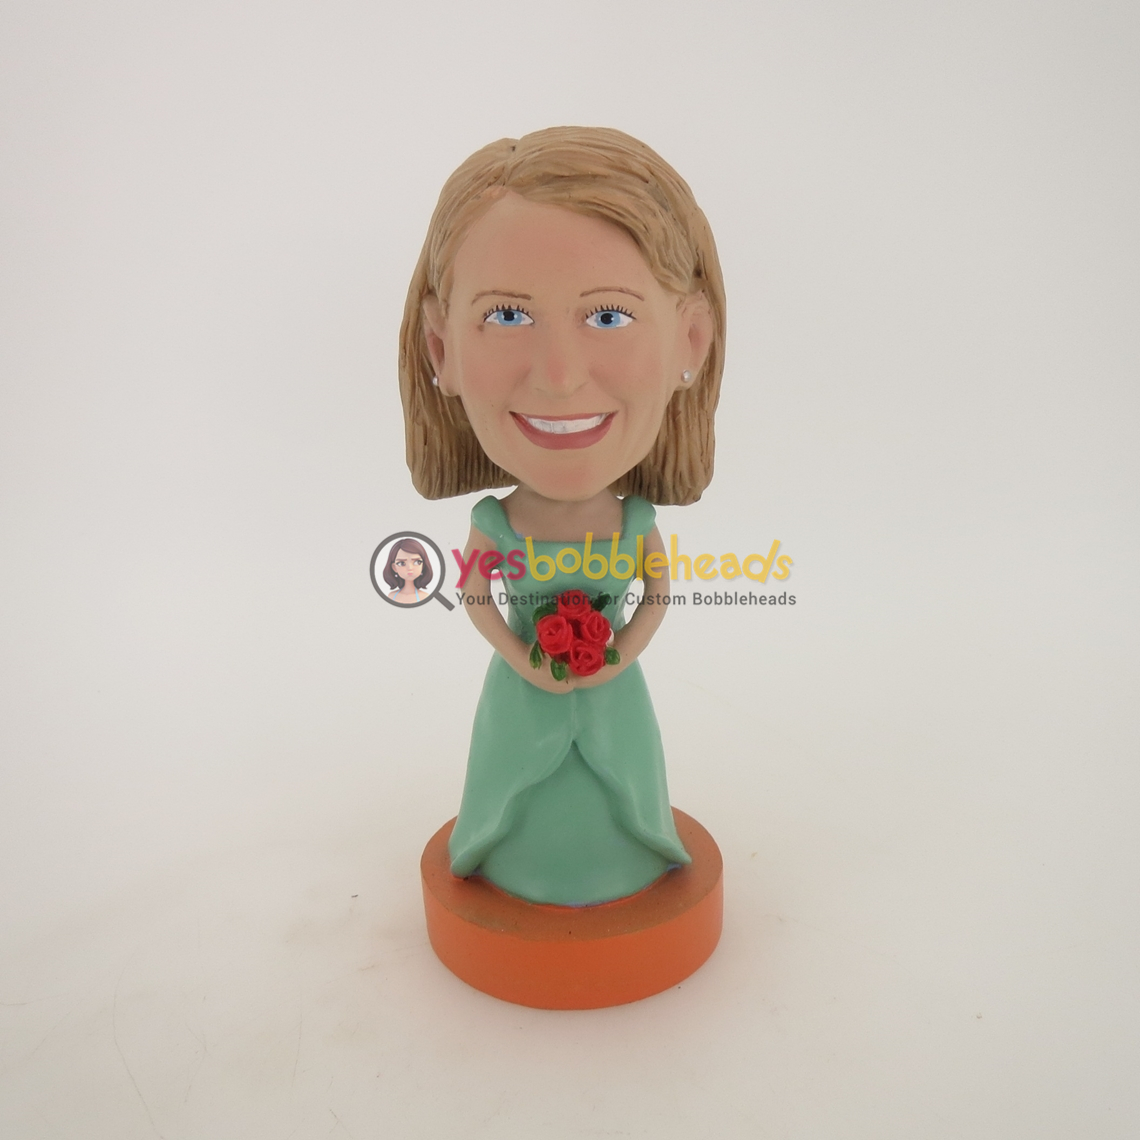 Picture of Custom Bobblehead Doll: Wedding Woman